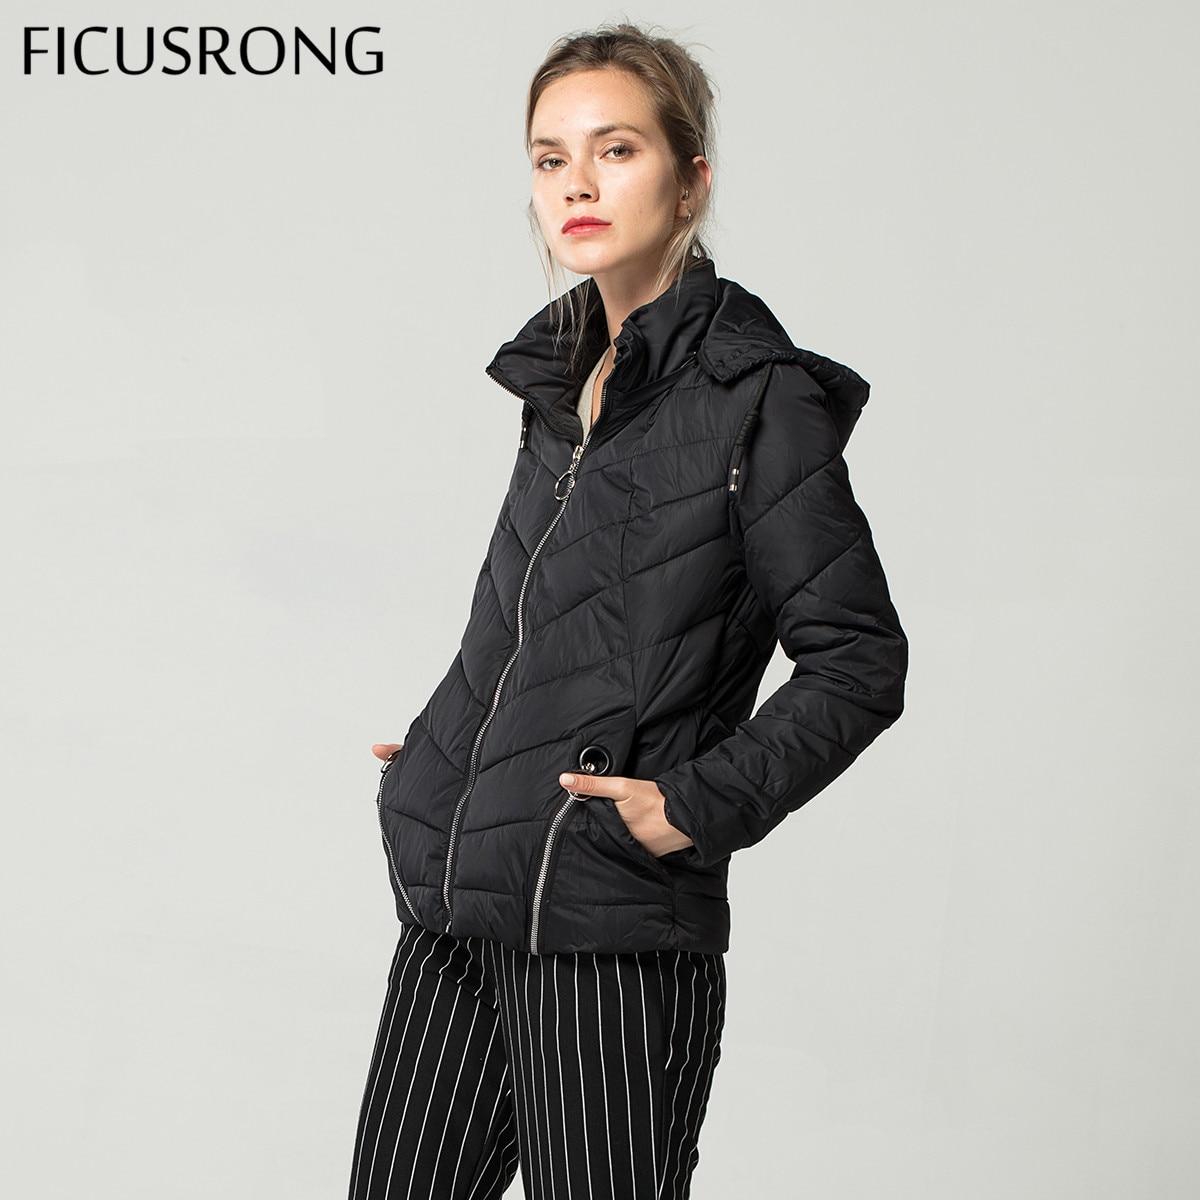 Fashion Short Soft Spring Autumn   Basic     Jacket   Women Cotton Padded   Jacket   Female Outerwear Womens Hooded Coats Tops FICUSRONG